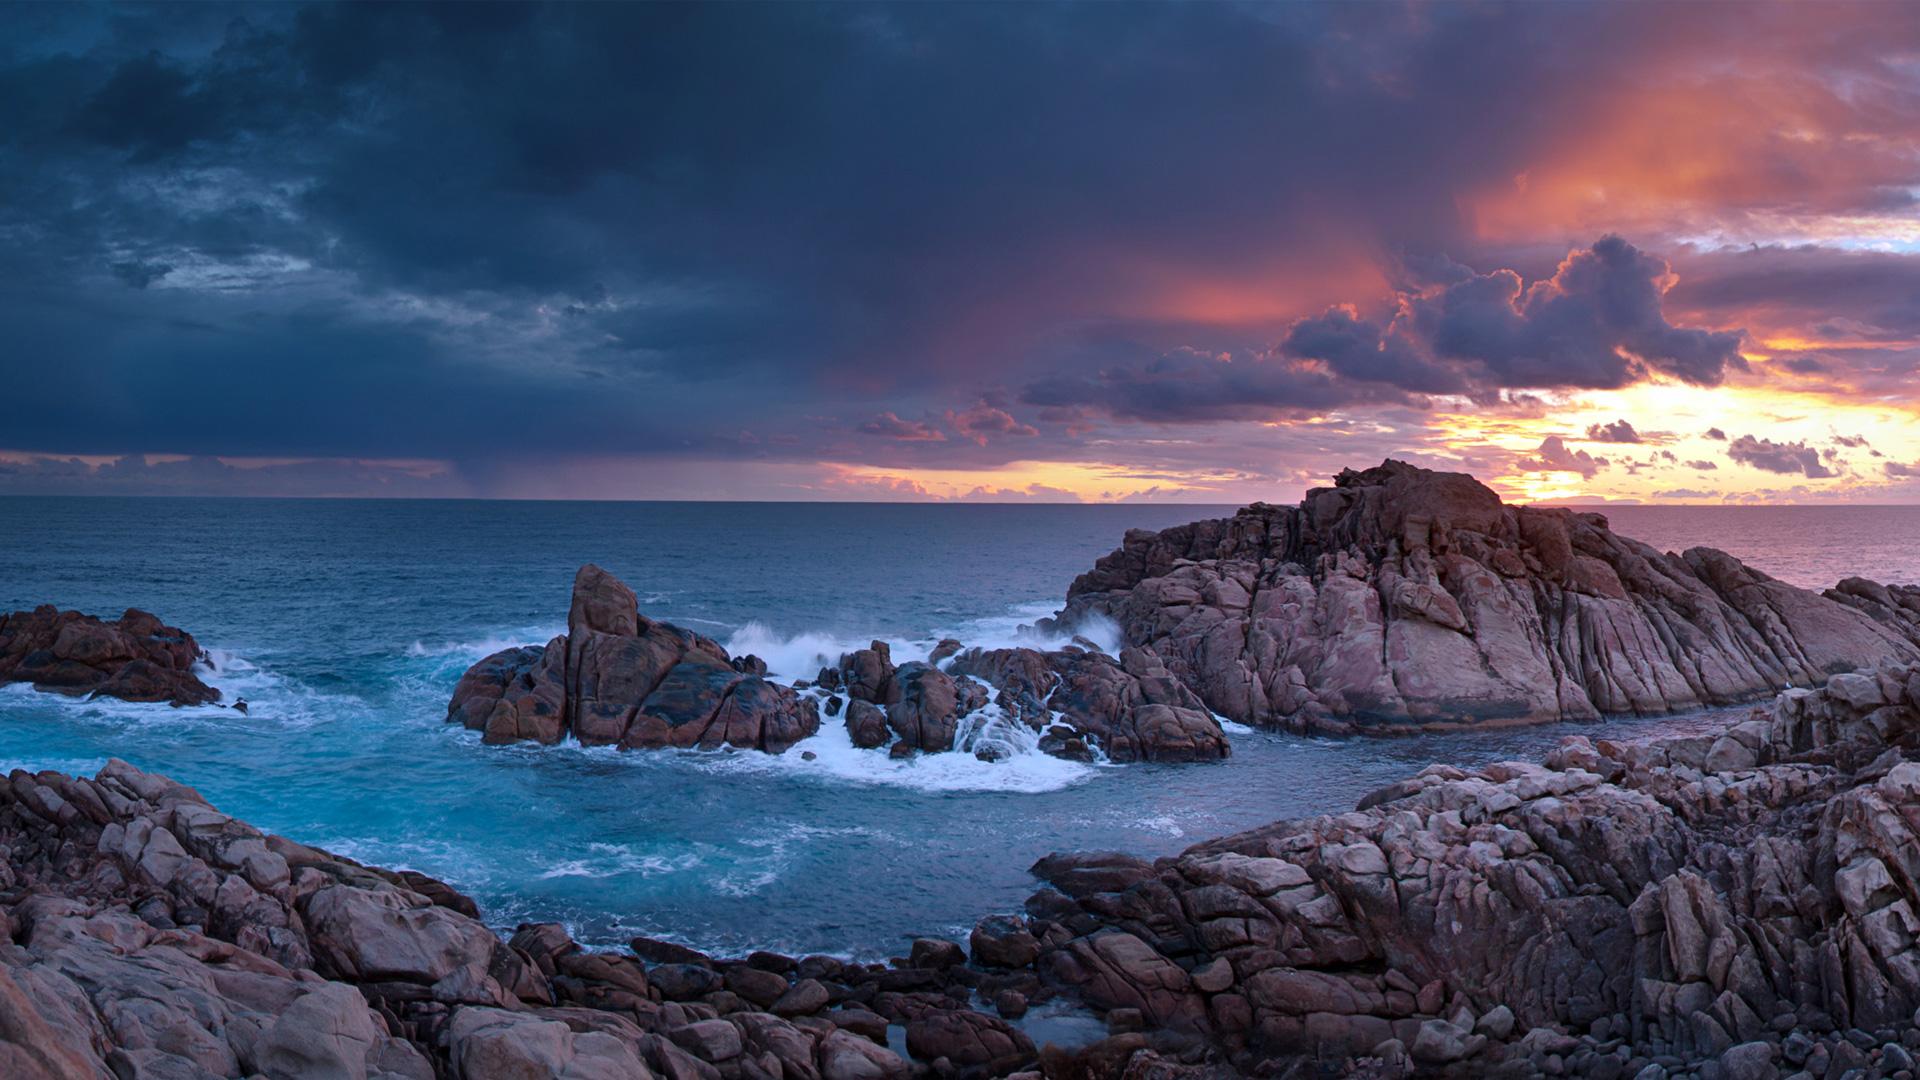 Захода солнца скалы канал-рокс Западная Австралия. обои скачать